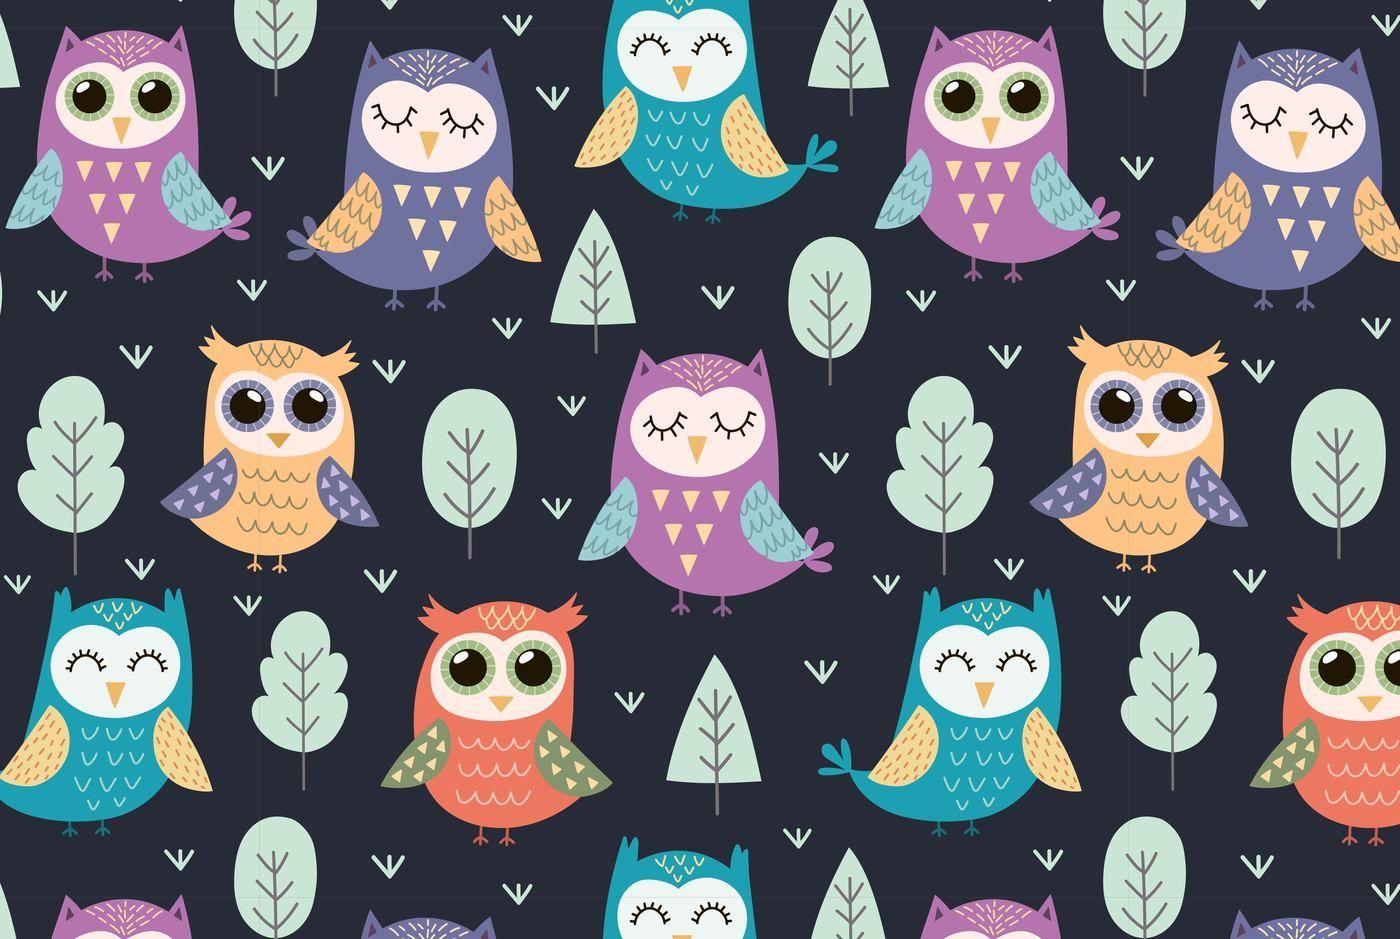 Owl Tales Seamless Pattern Elements By Juliyas Art